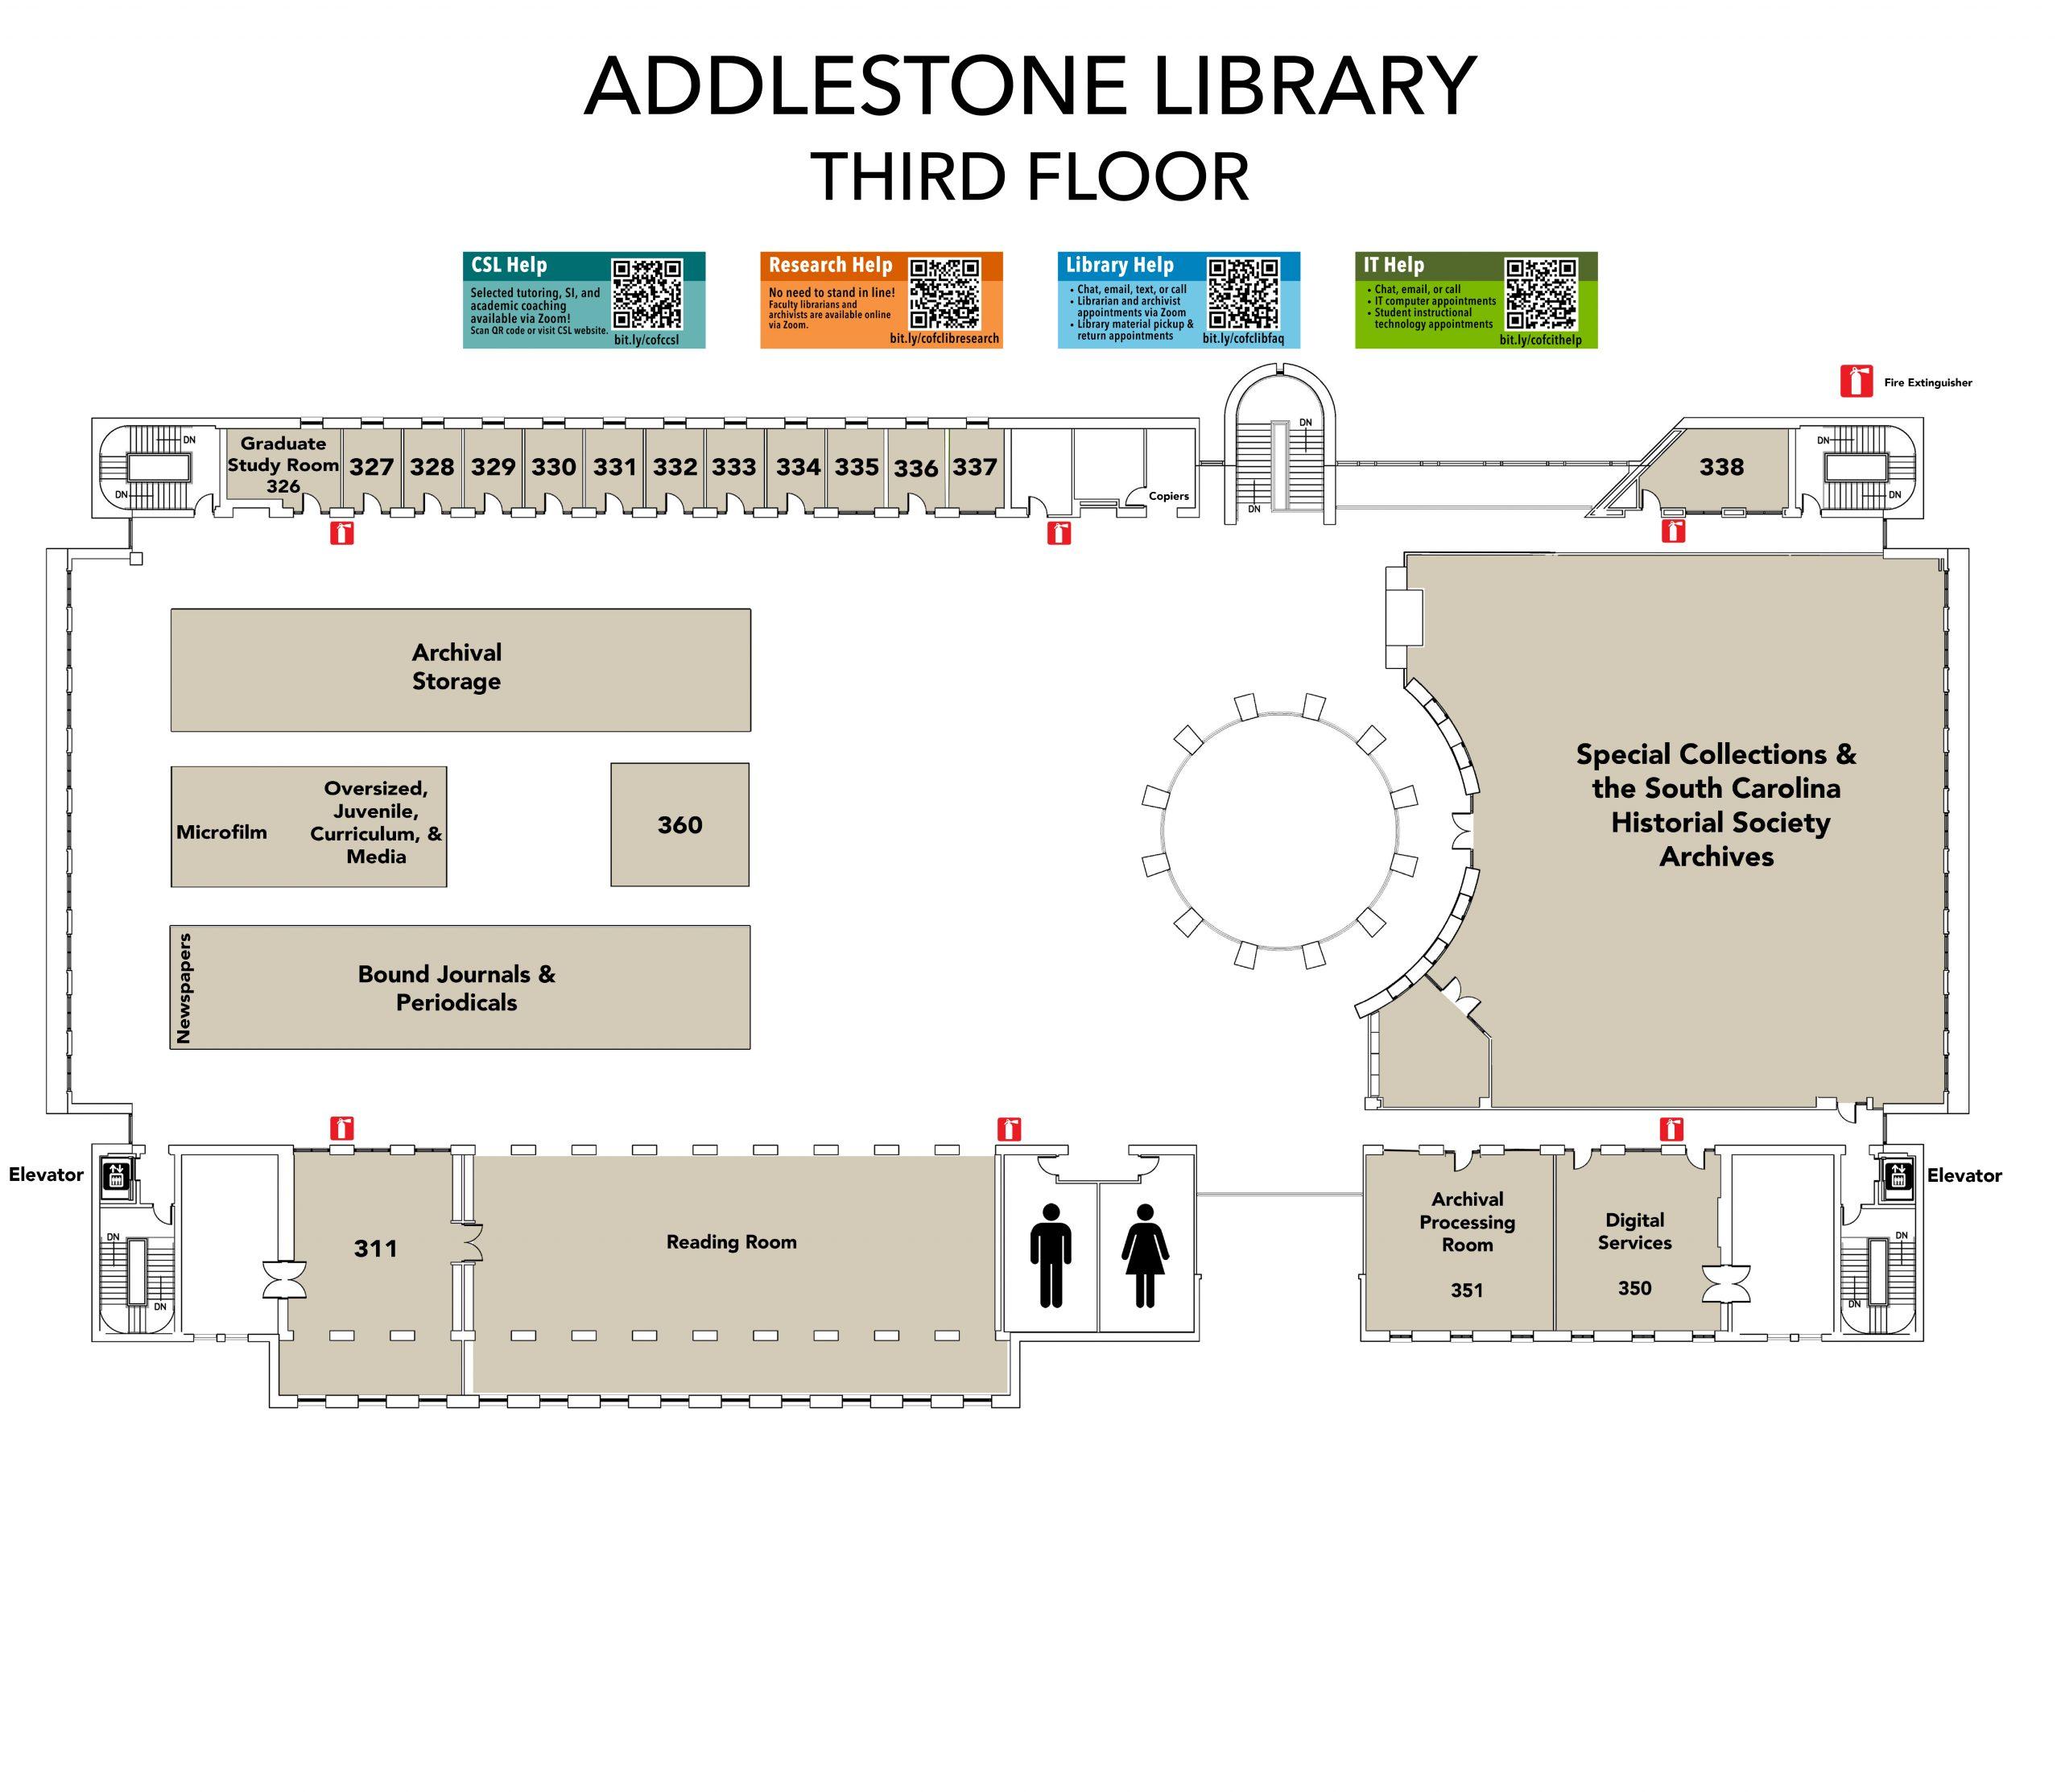 Addlestone Library Floorplans Level 3